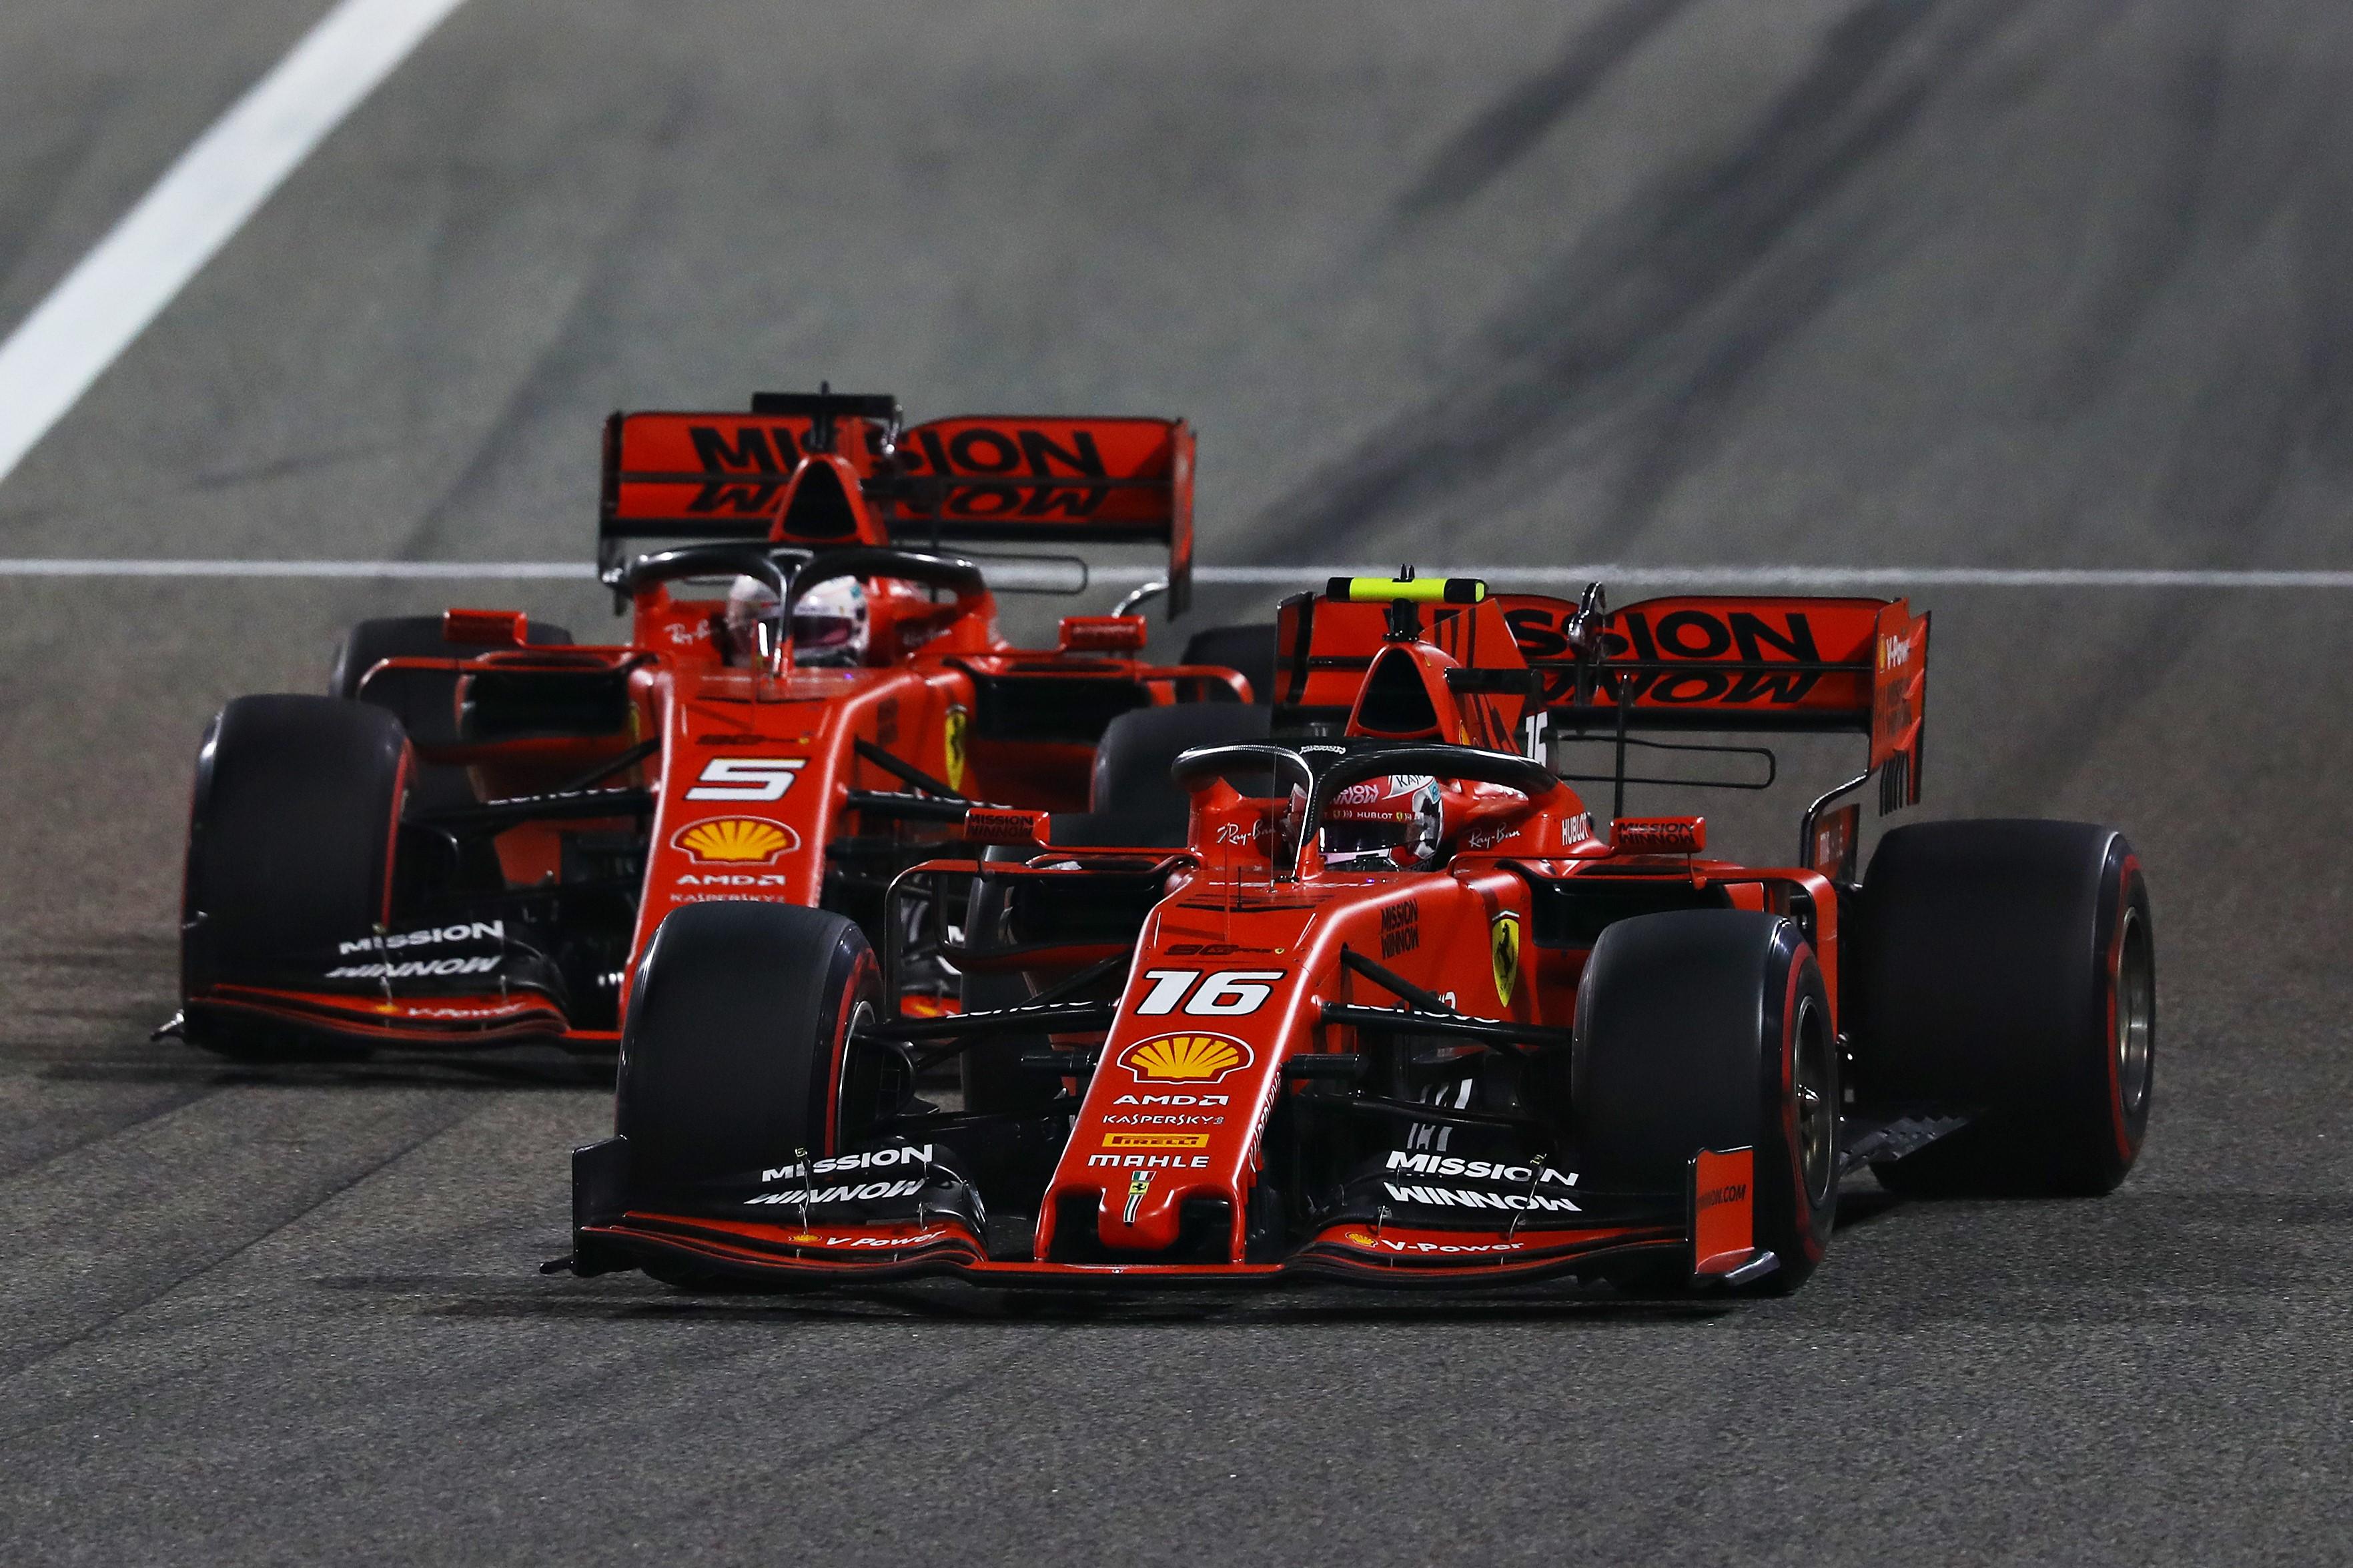 Charles Leclerc et Sebastian Vettel pendant le Grand Prix de Bahrein